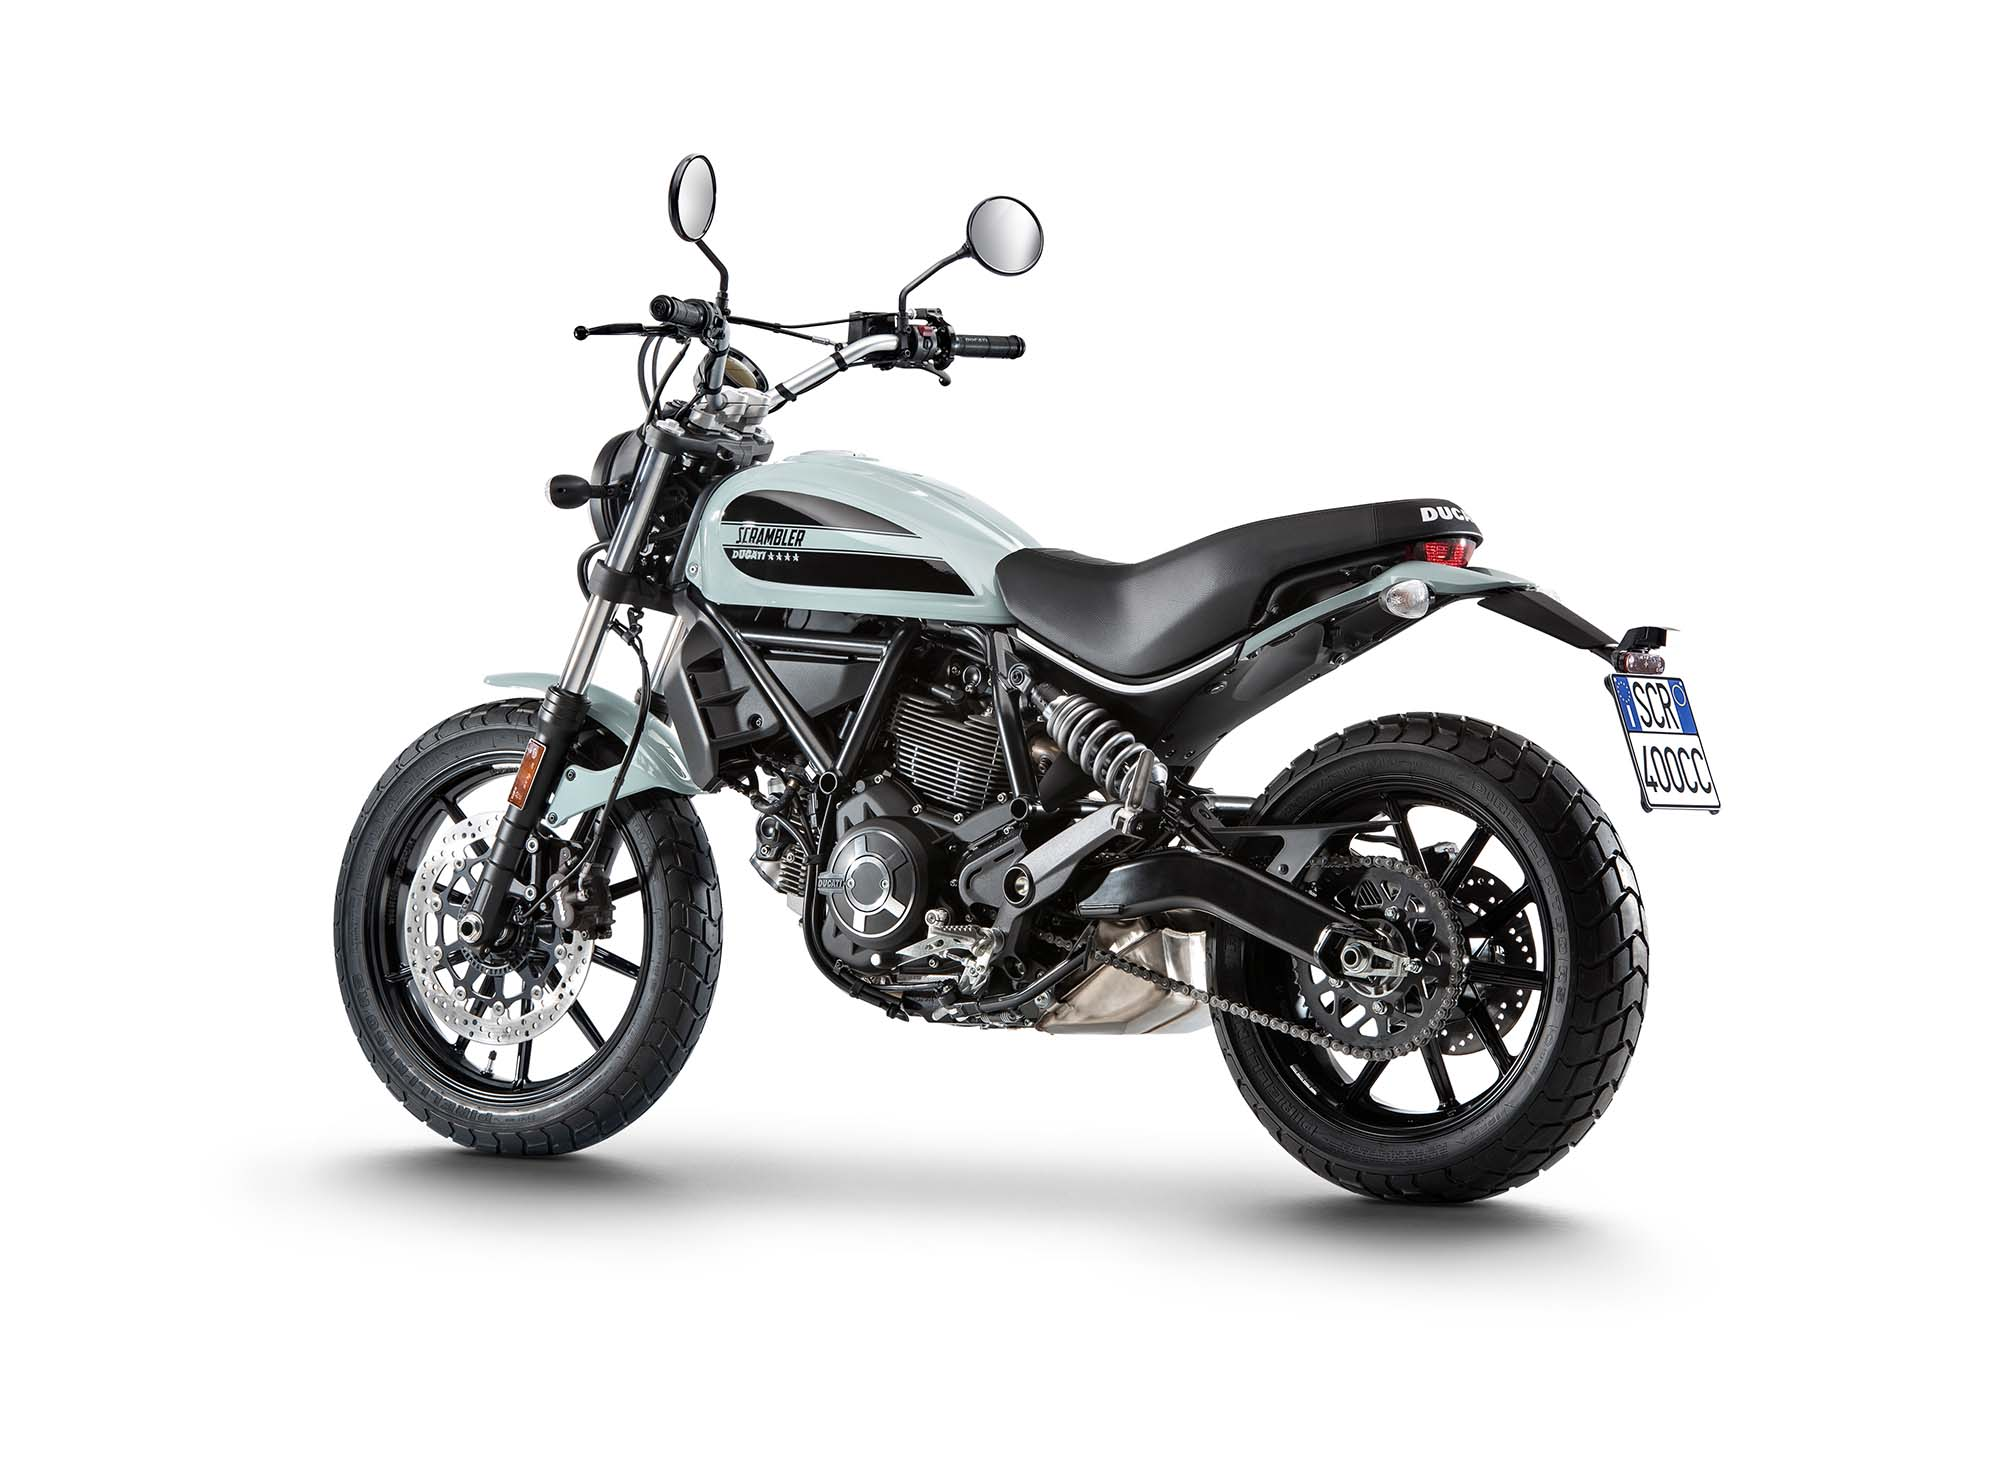 Ducati Scrambler Enduro Weight